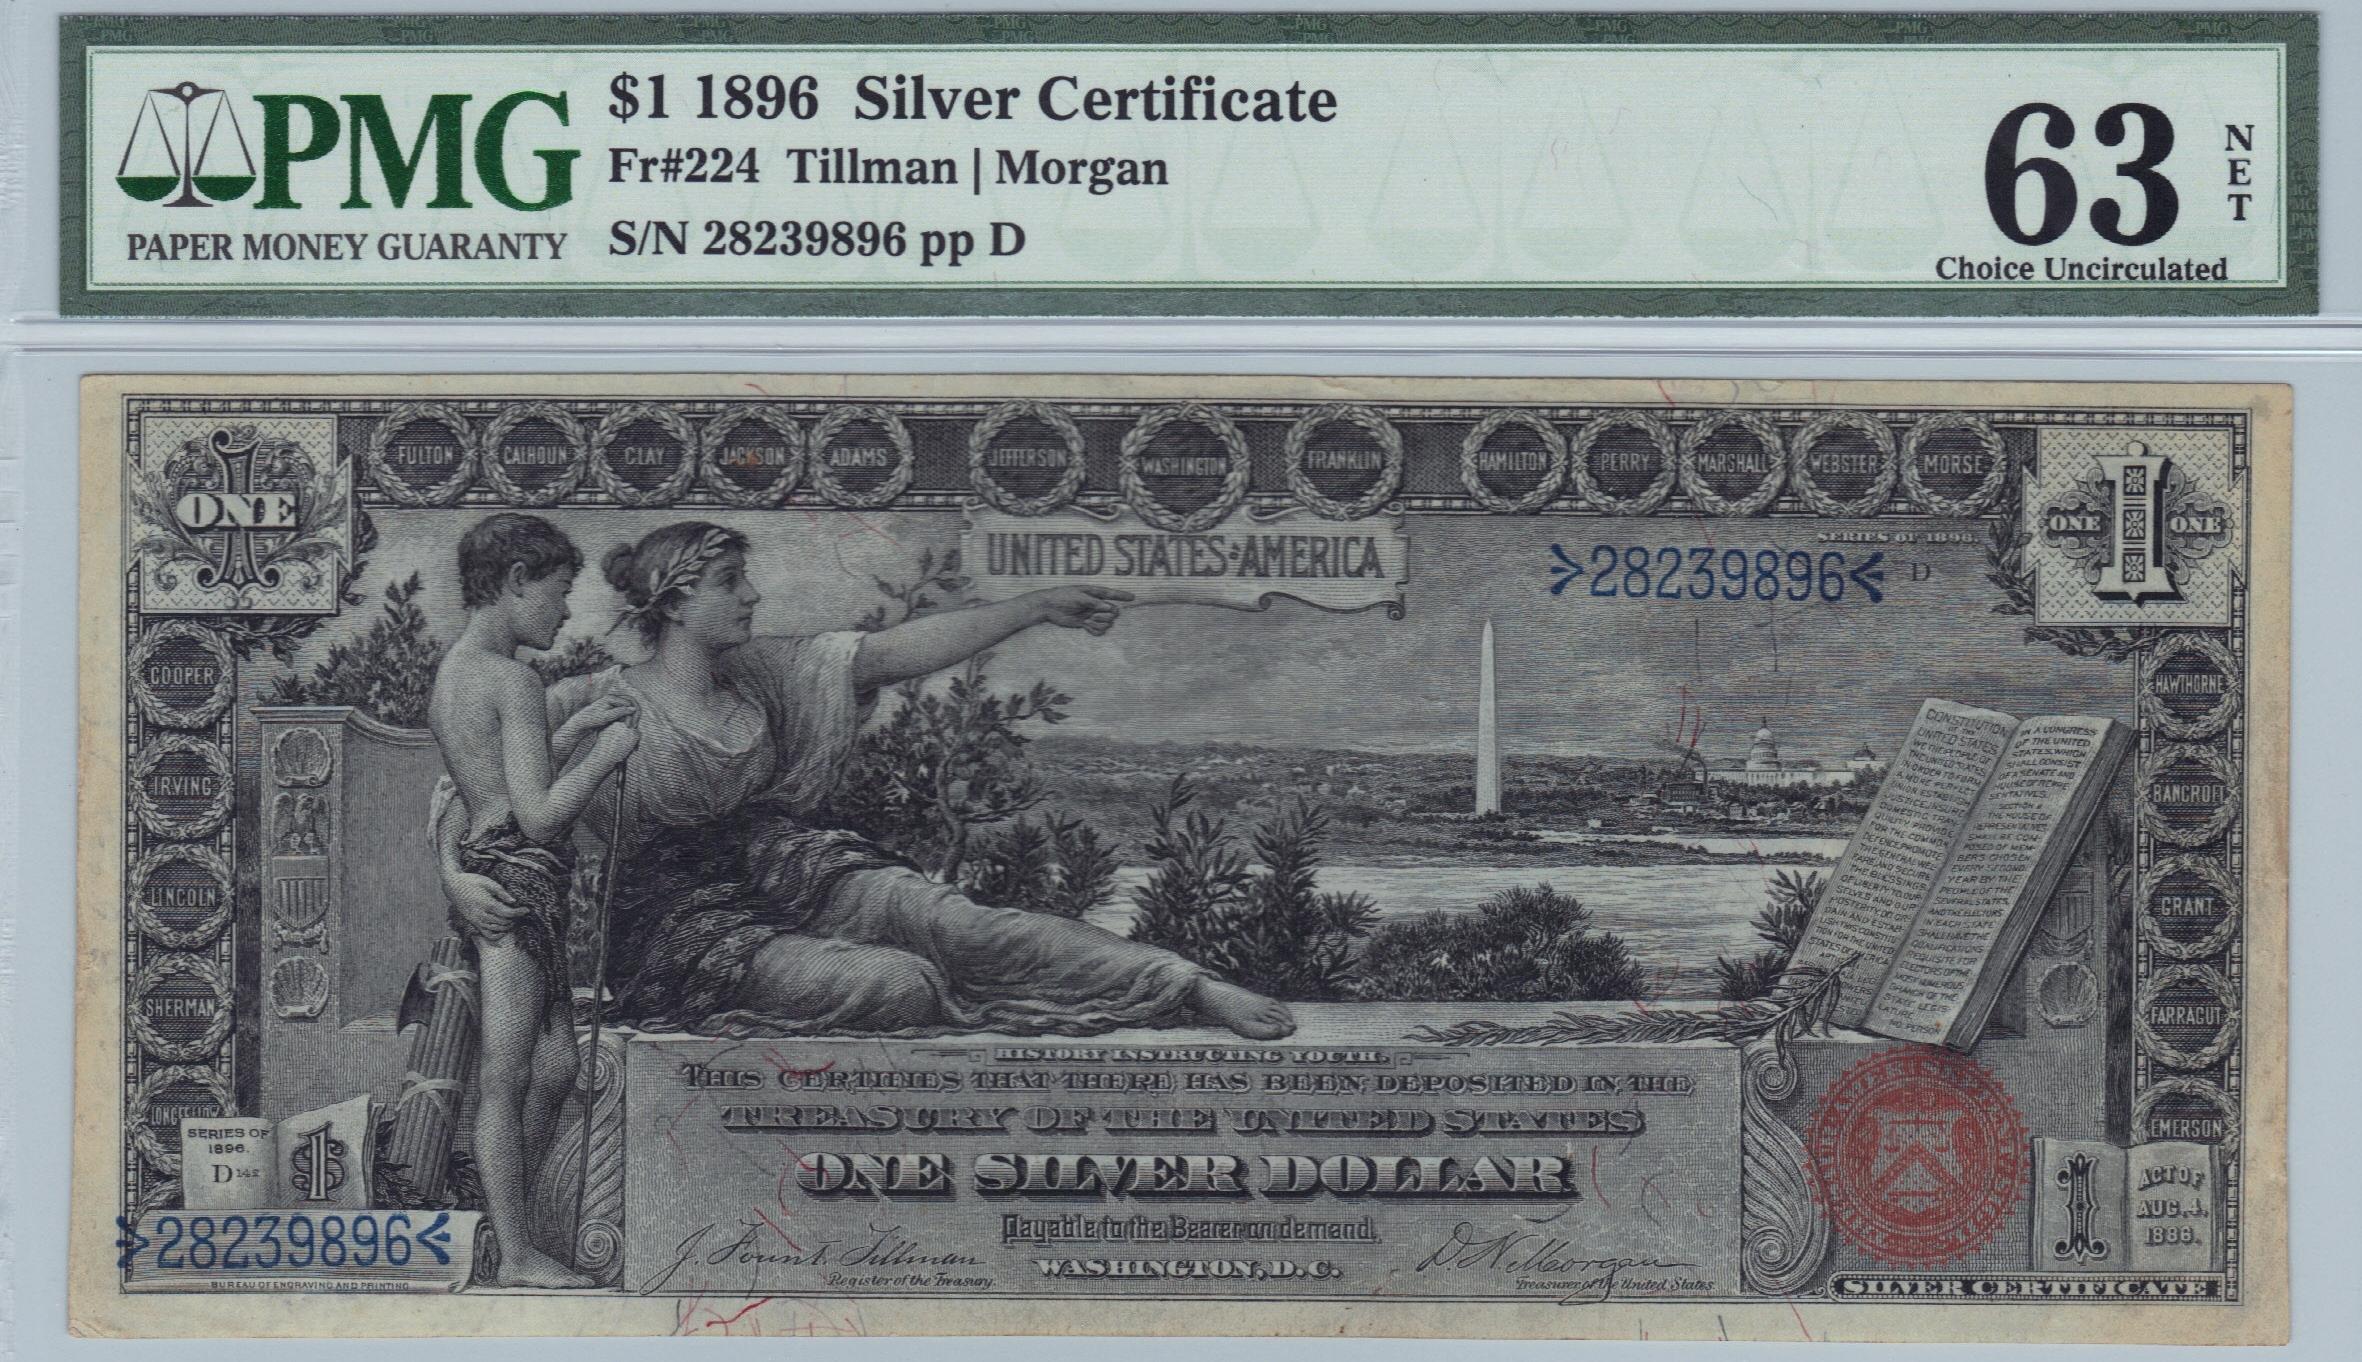 Lot 200 Fr 224 1896 1 Silver Certificate Manifest